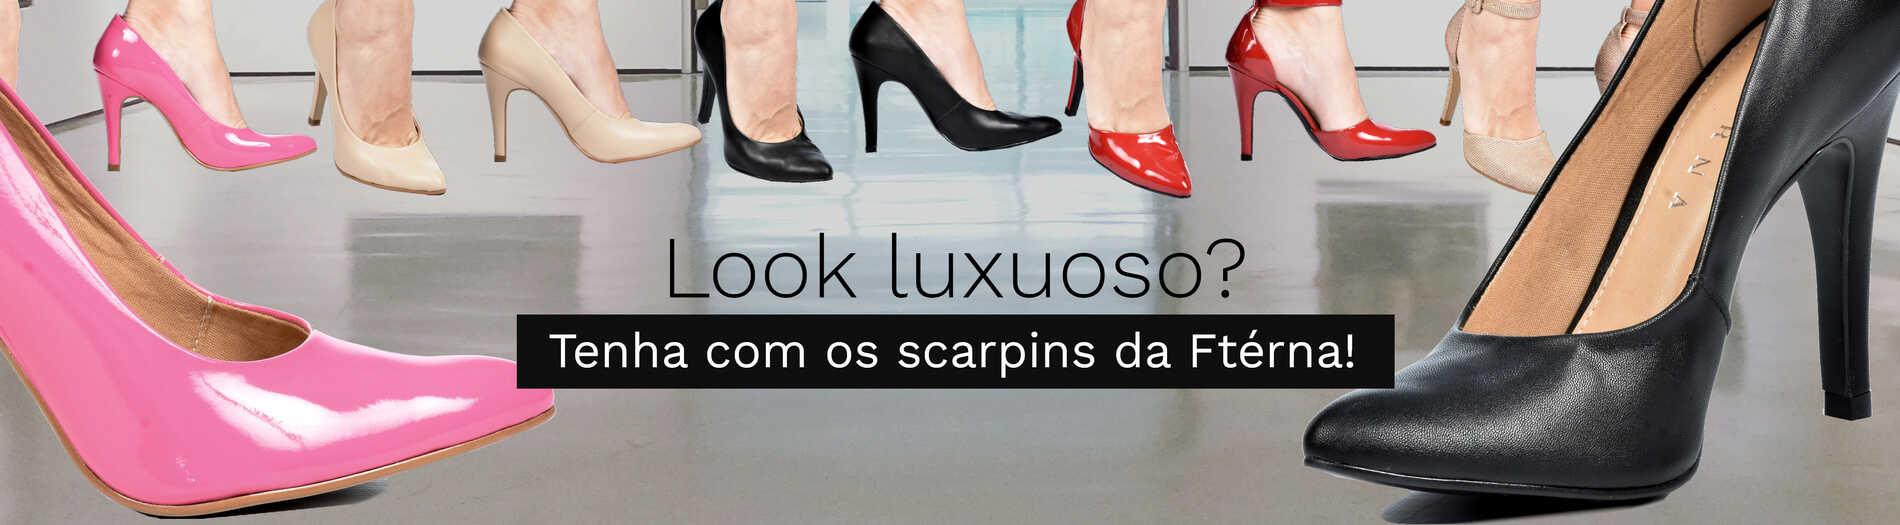 Look Luxuoso Ftérna.